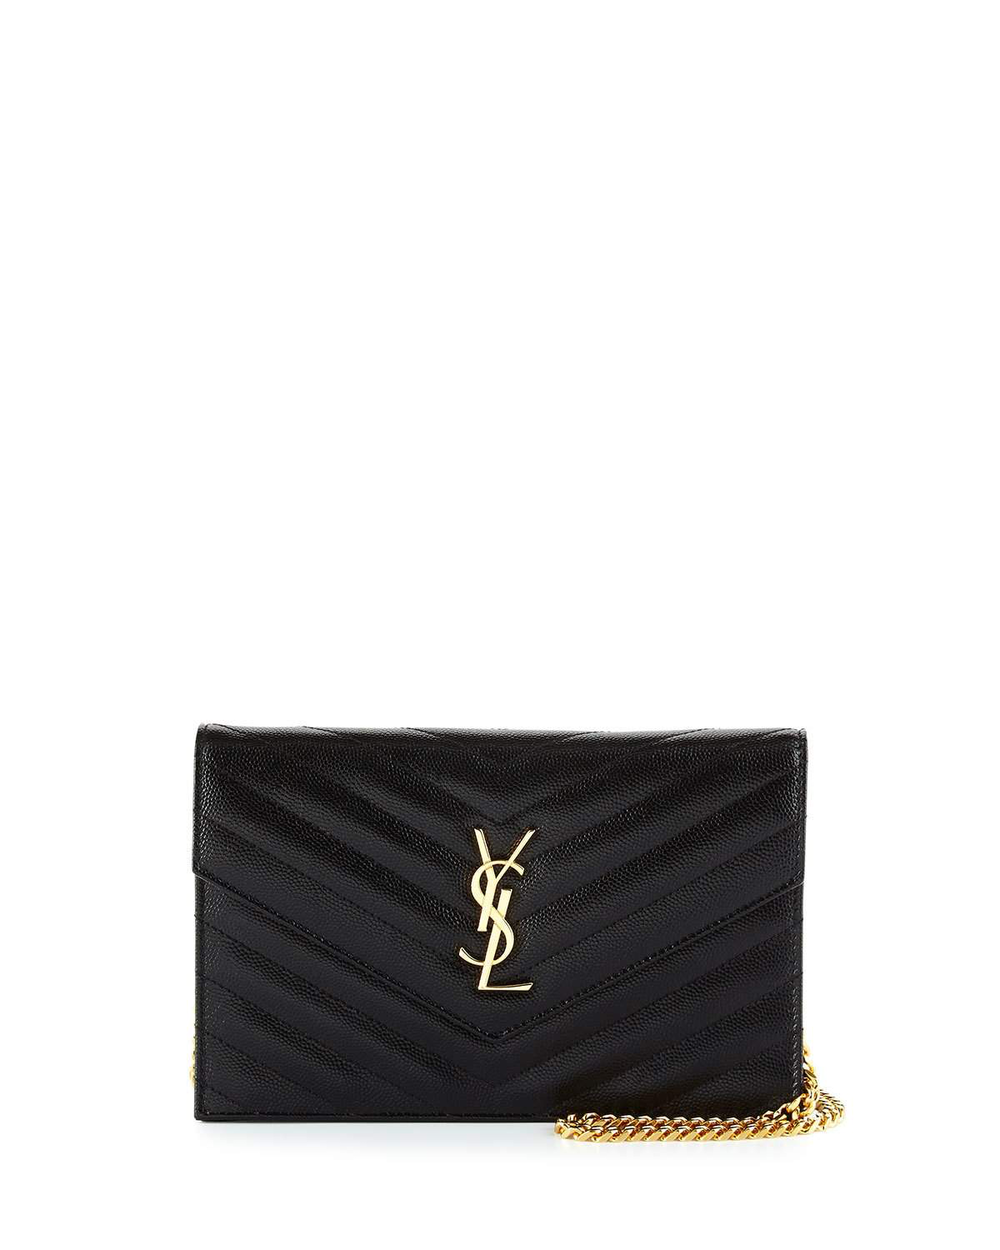 The It Bag - Saint Laurent Small Monogram Leather Chain Wallet